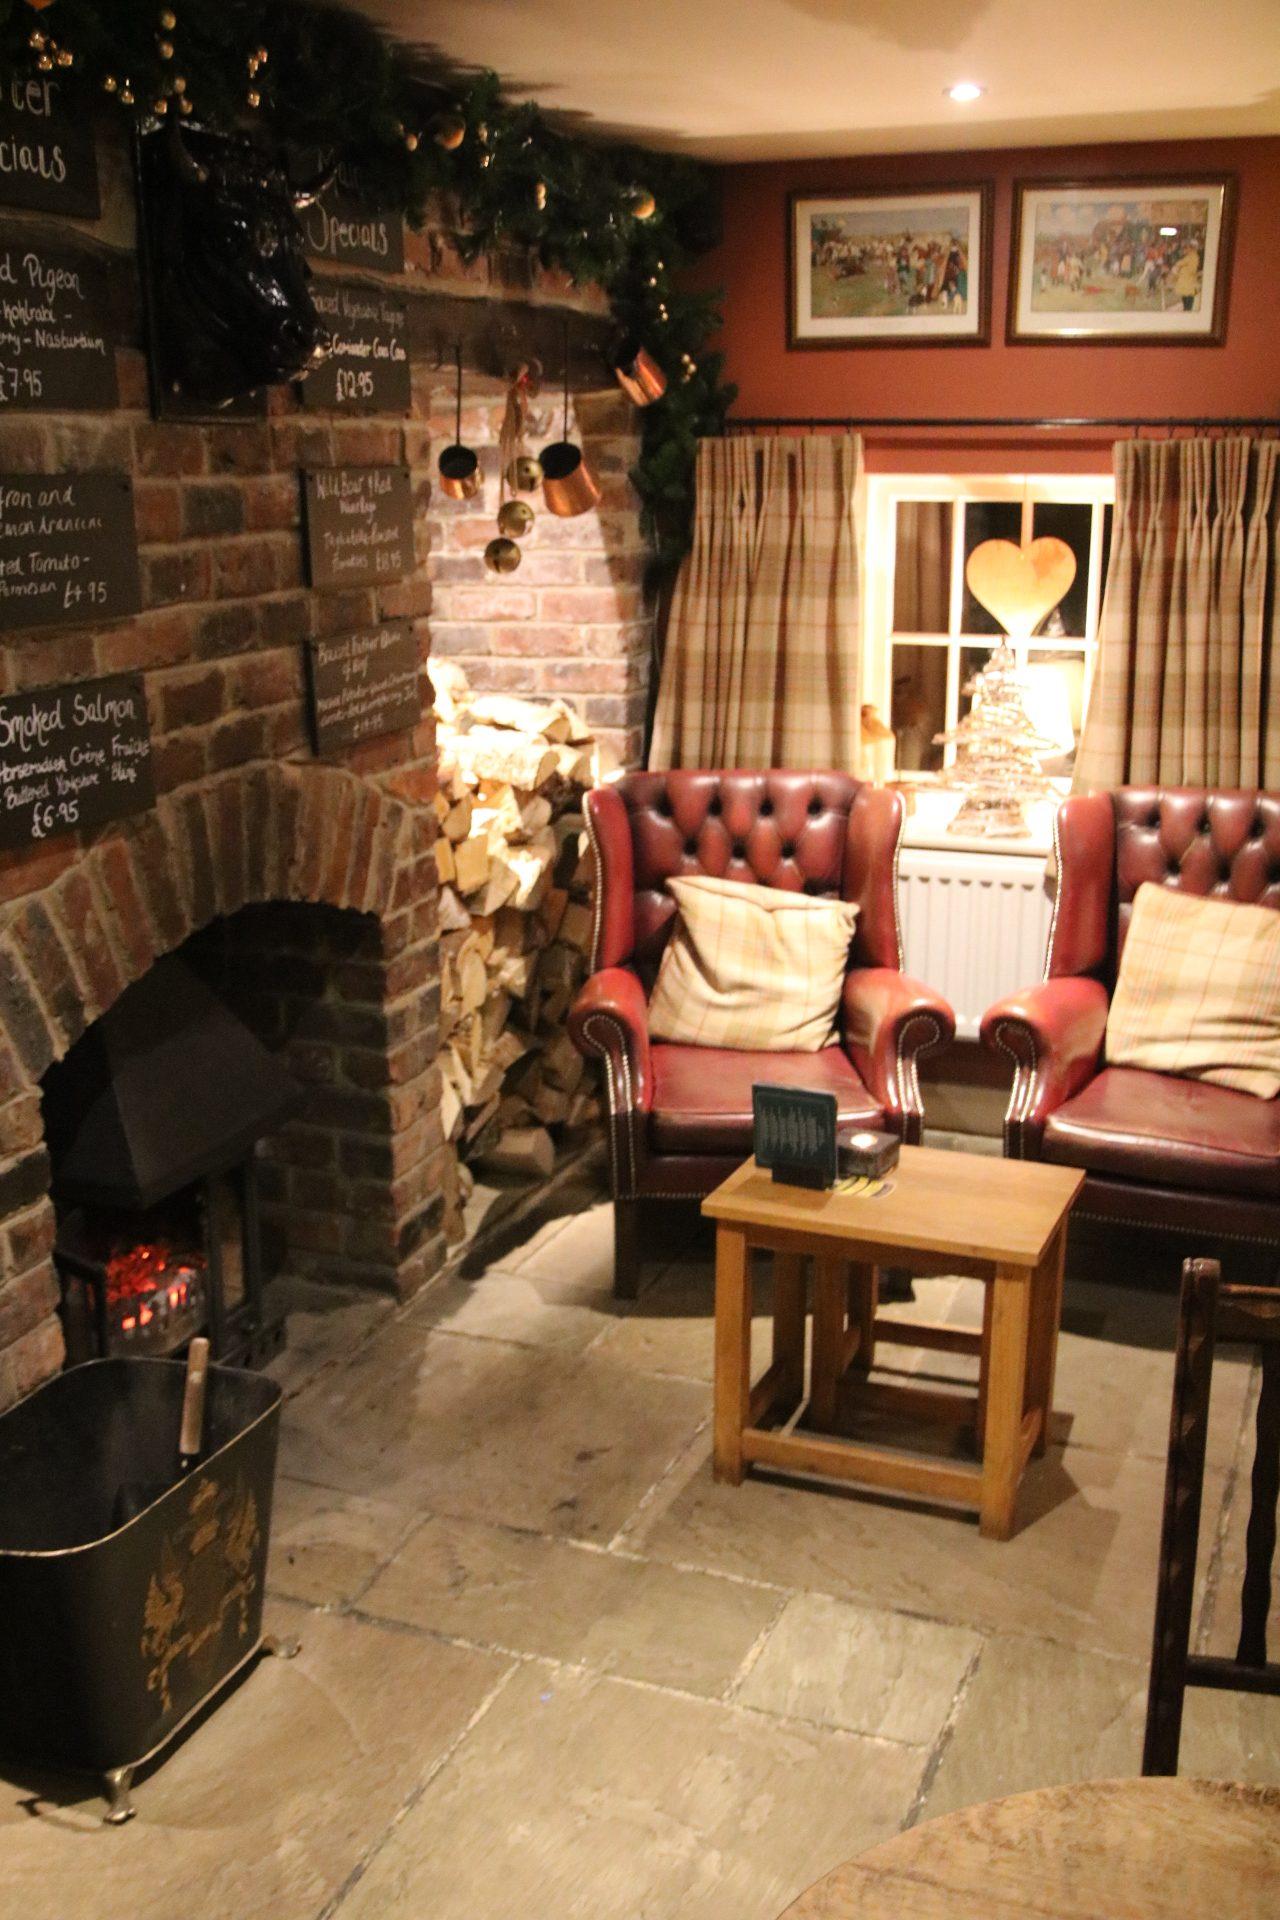 Black Bull Inn at Moulton Review